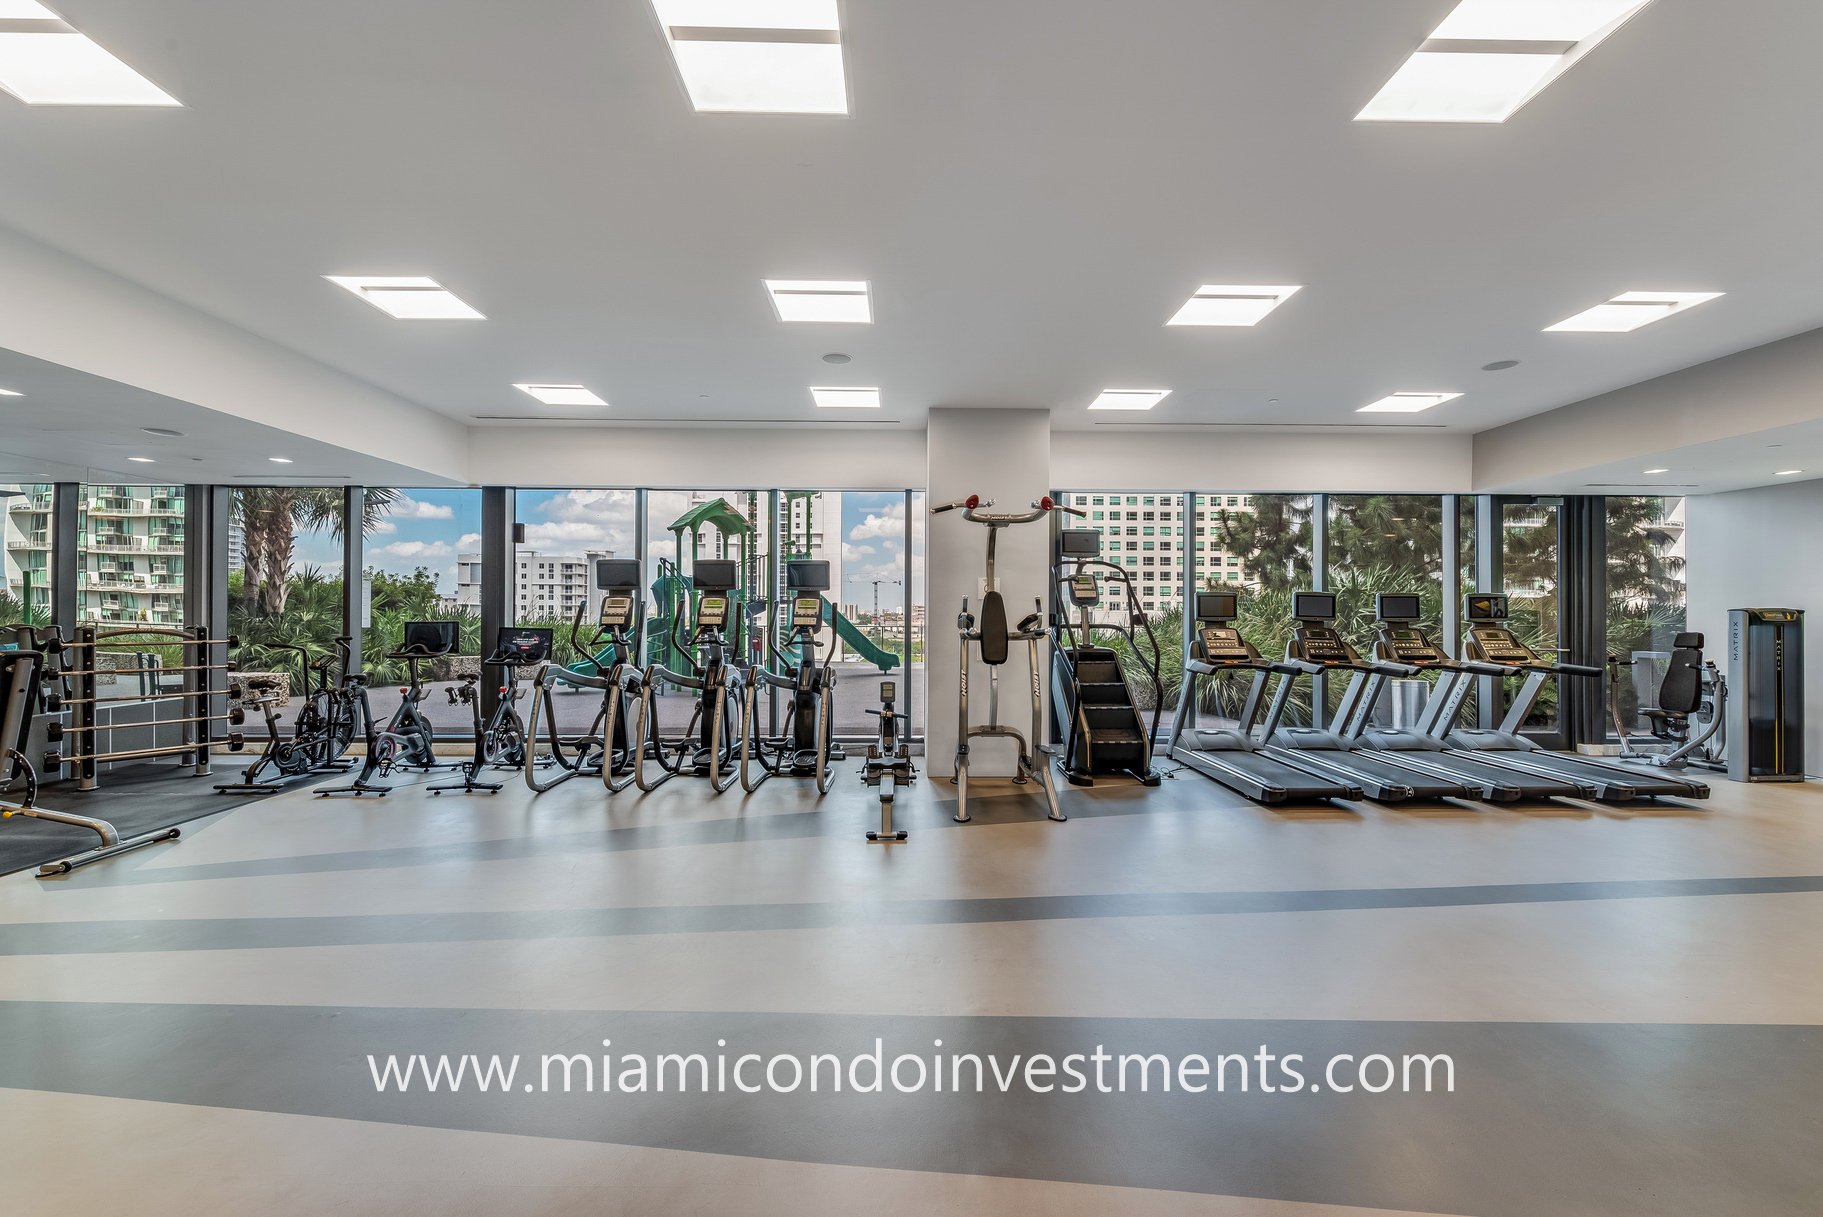 Rise fitness center